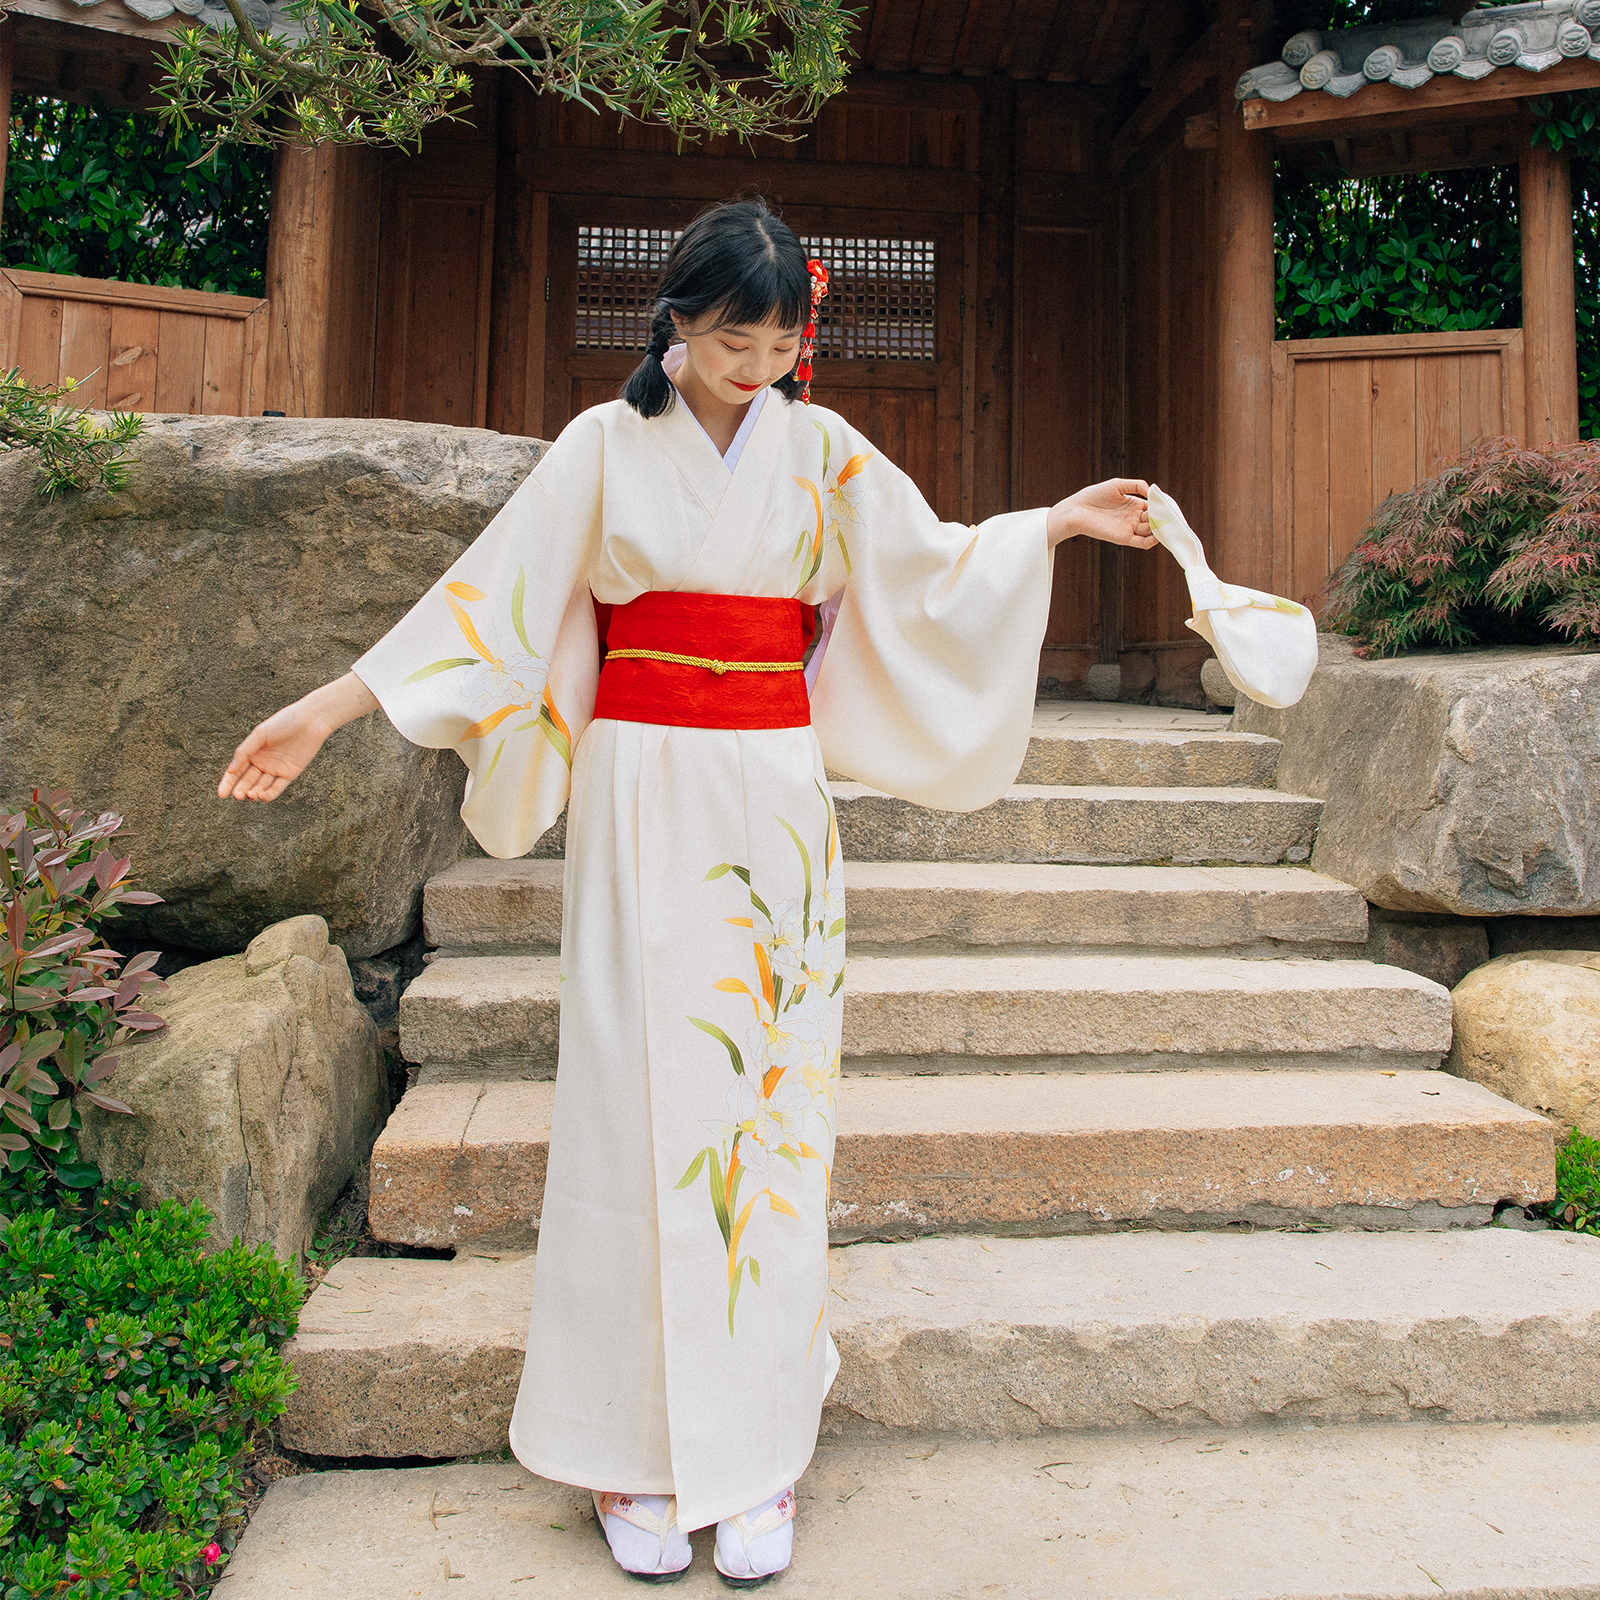 Vestido de verano con estampado de flores Color amarillo Yukata japonés tradicional Kimono para mujer Kimono de satén para hombre japonés disfraz de samurai japonés dragón chino pijamas Haori ropa asiática vestidos de noche fiesta en casa Yukata